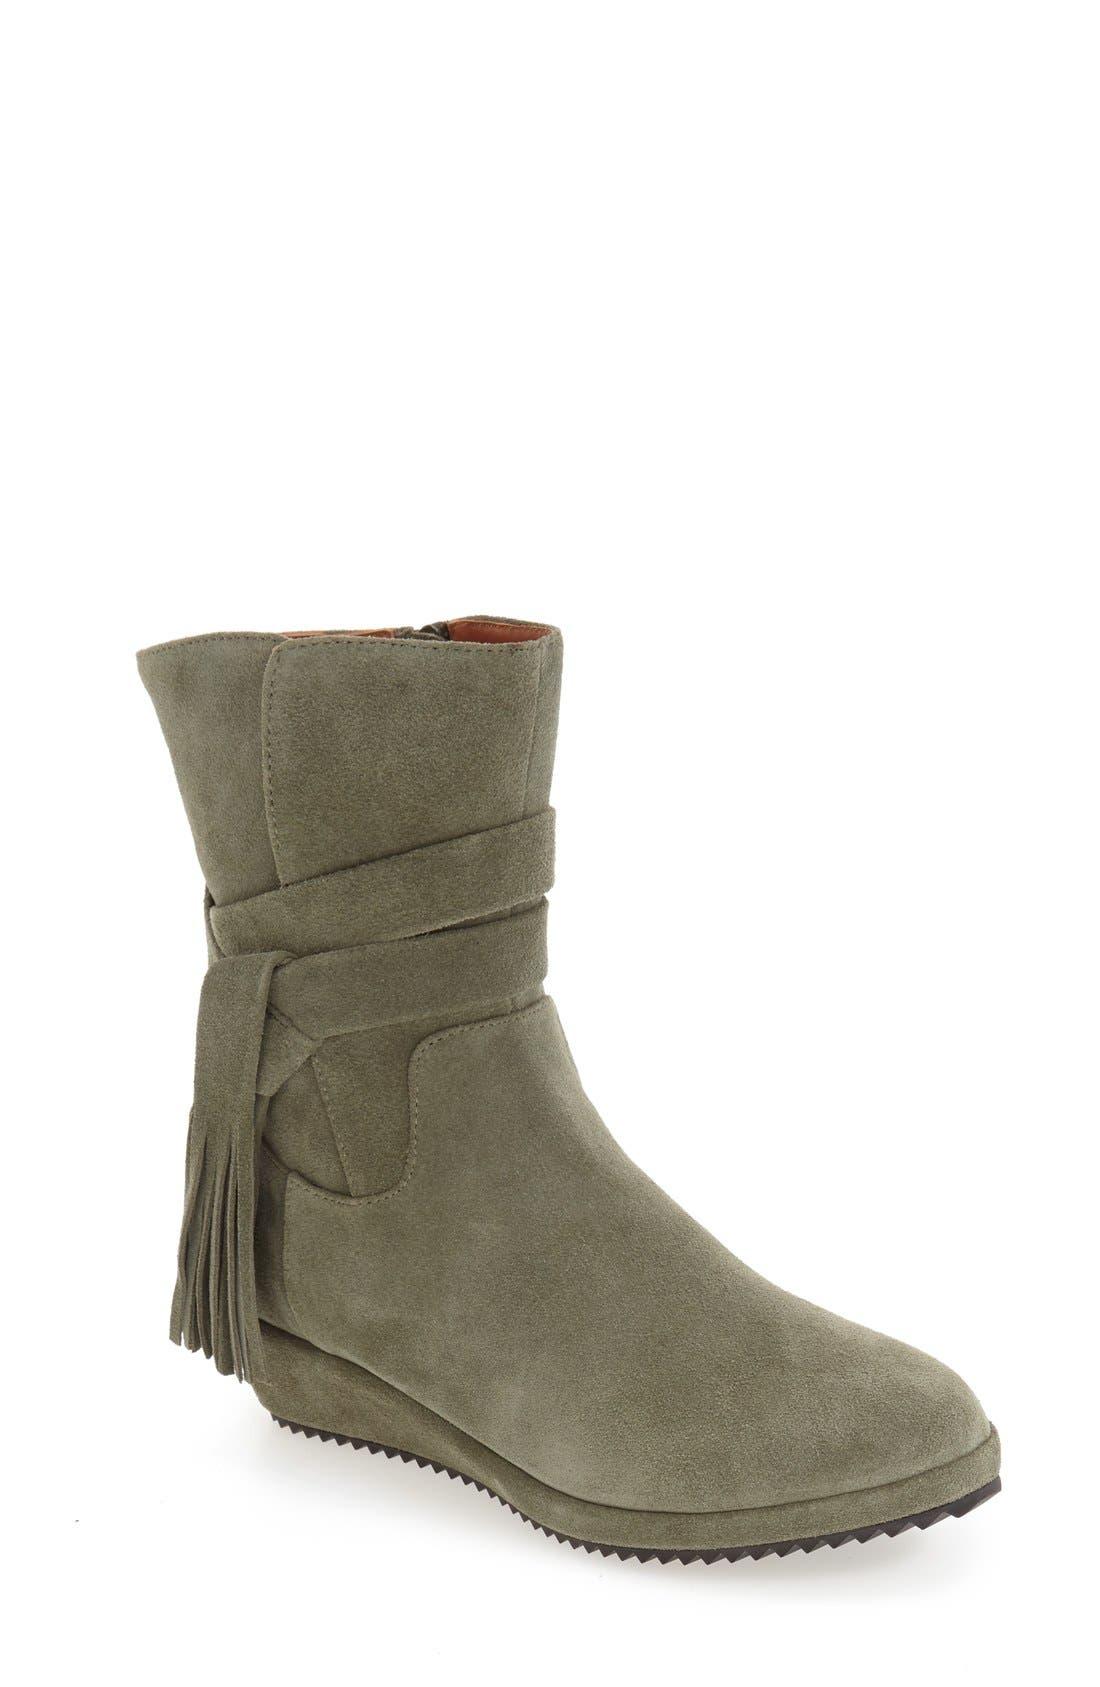 Womens Boots cordani bergen wn nubuck eo5e39p5